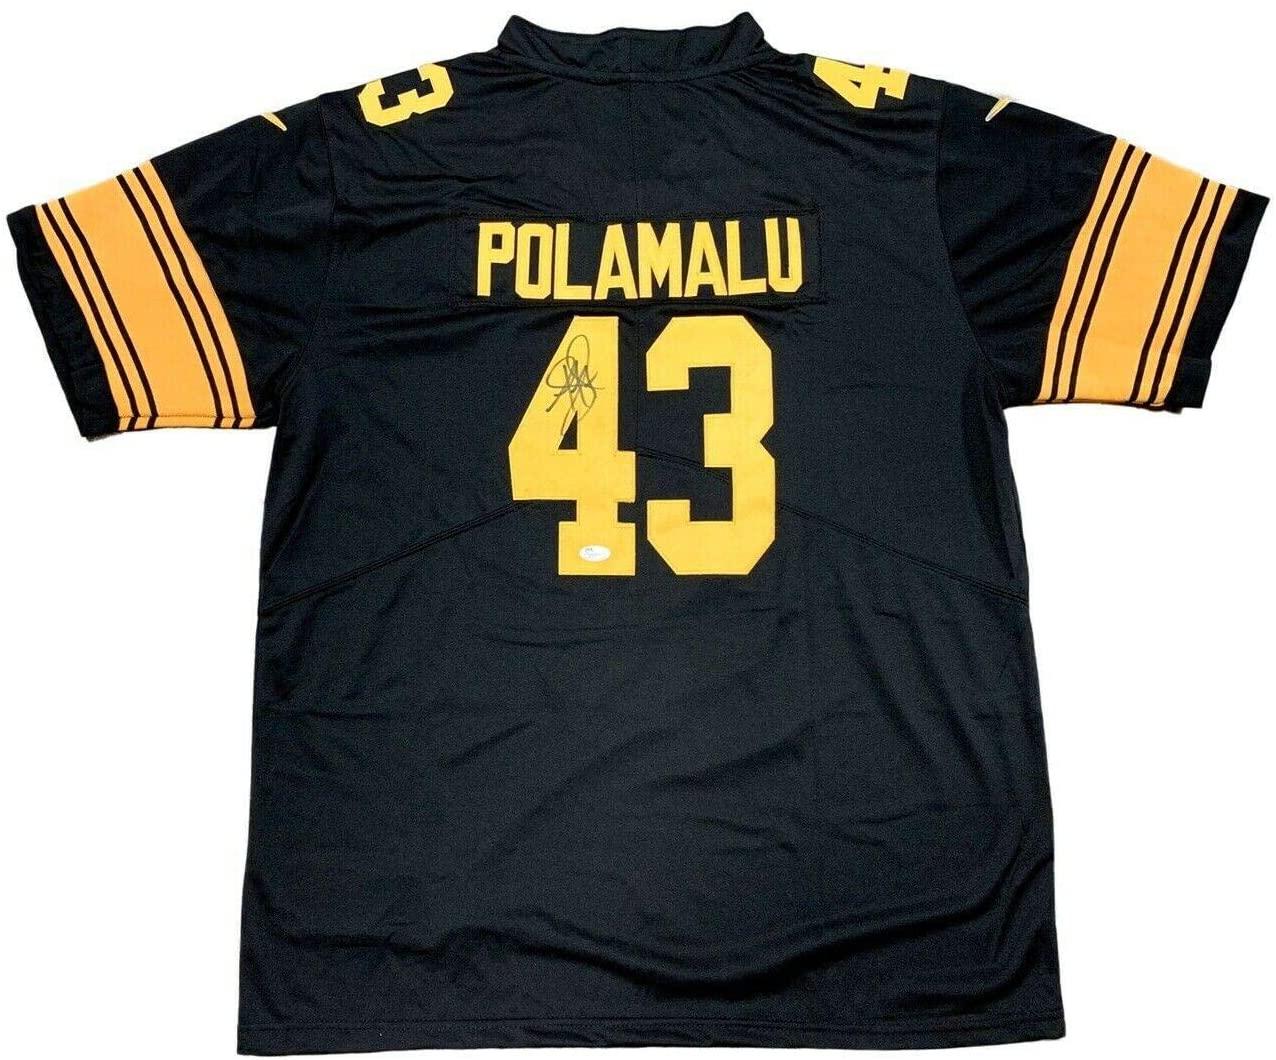 Autographed Troy Polamalu Jersey - 75th Anniversary - JSA Certified - Autographed NFL Jerseys